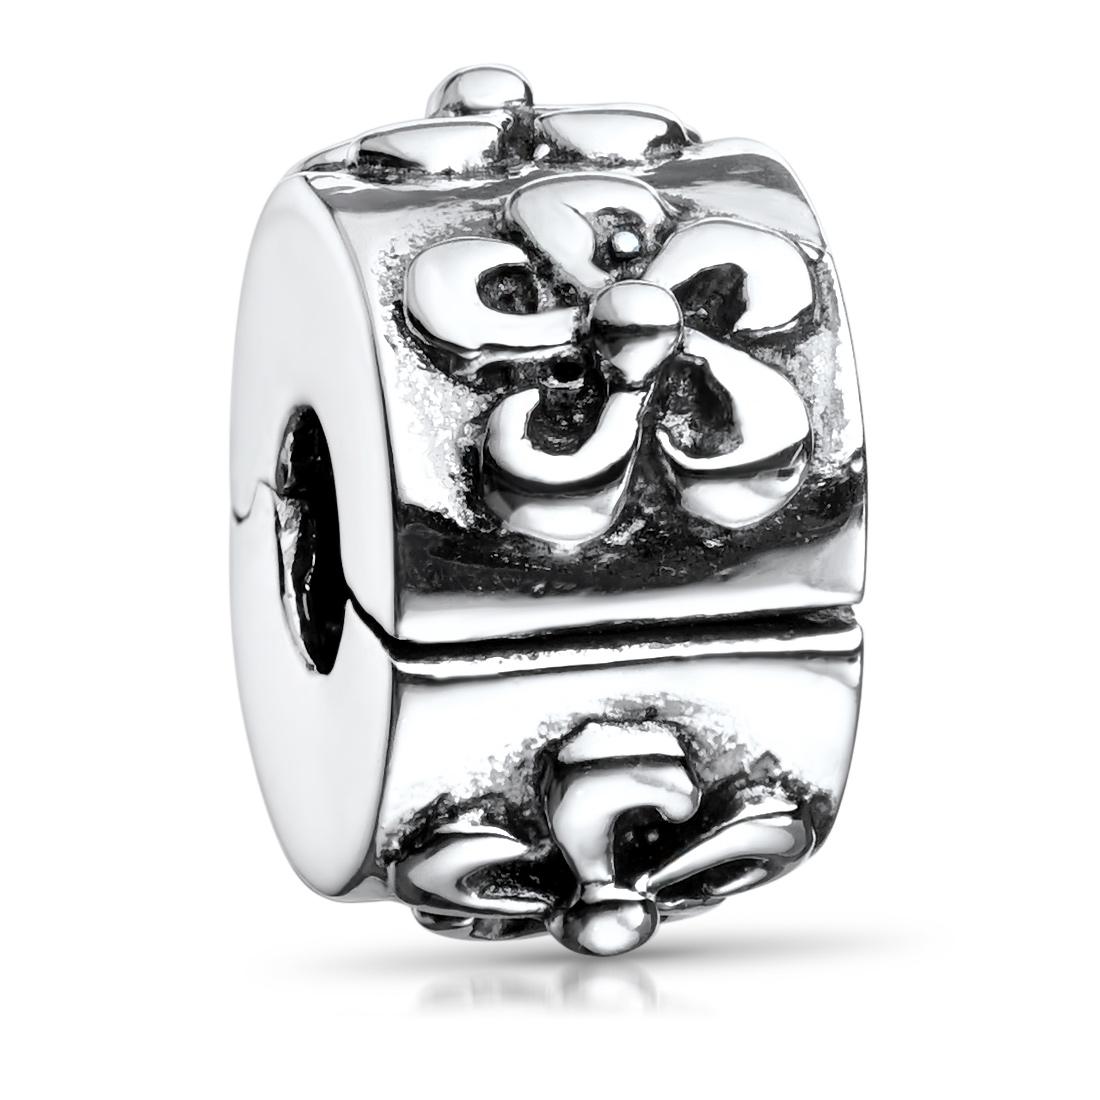 MATERIA Clip Charms Anhänger Silber 925 - antik Beads Perle